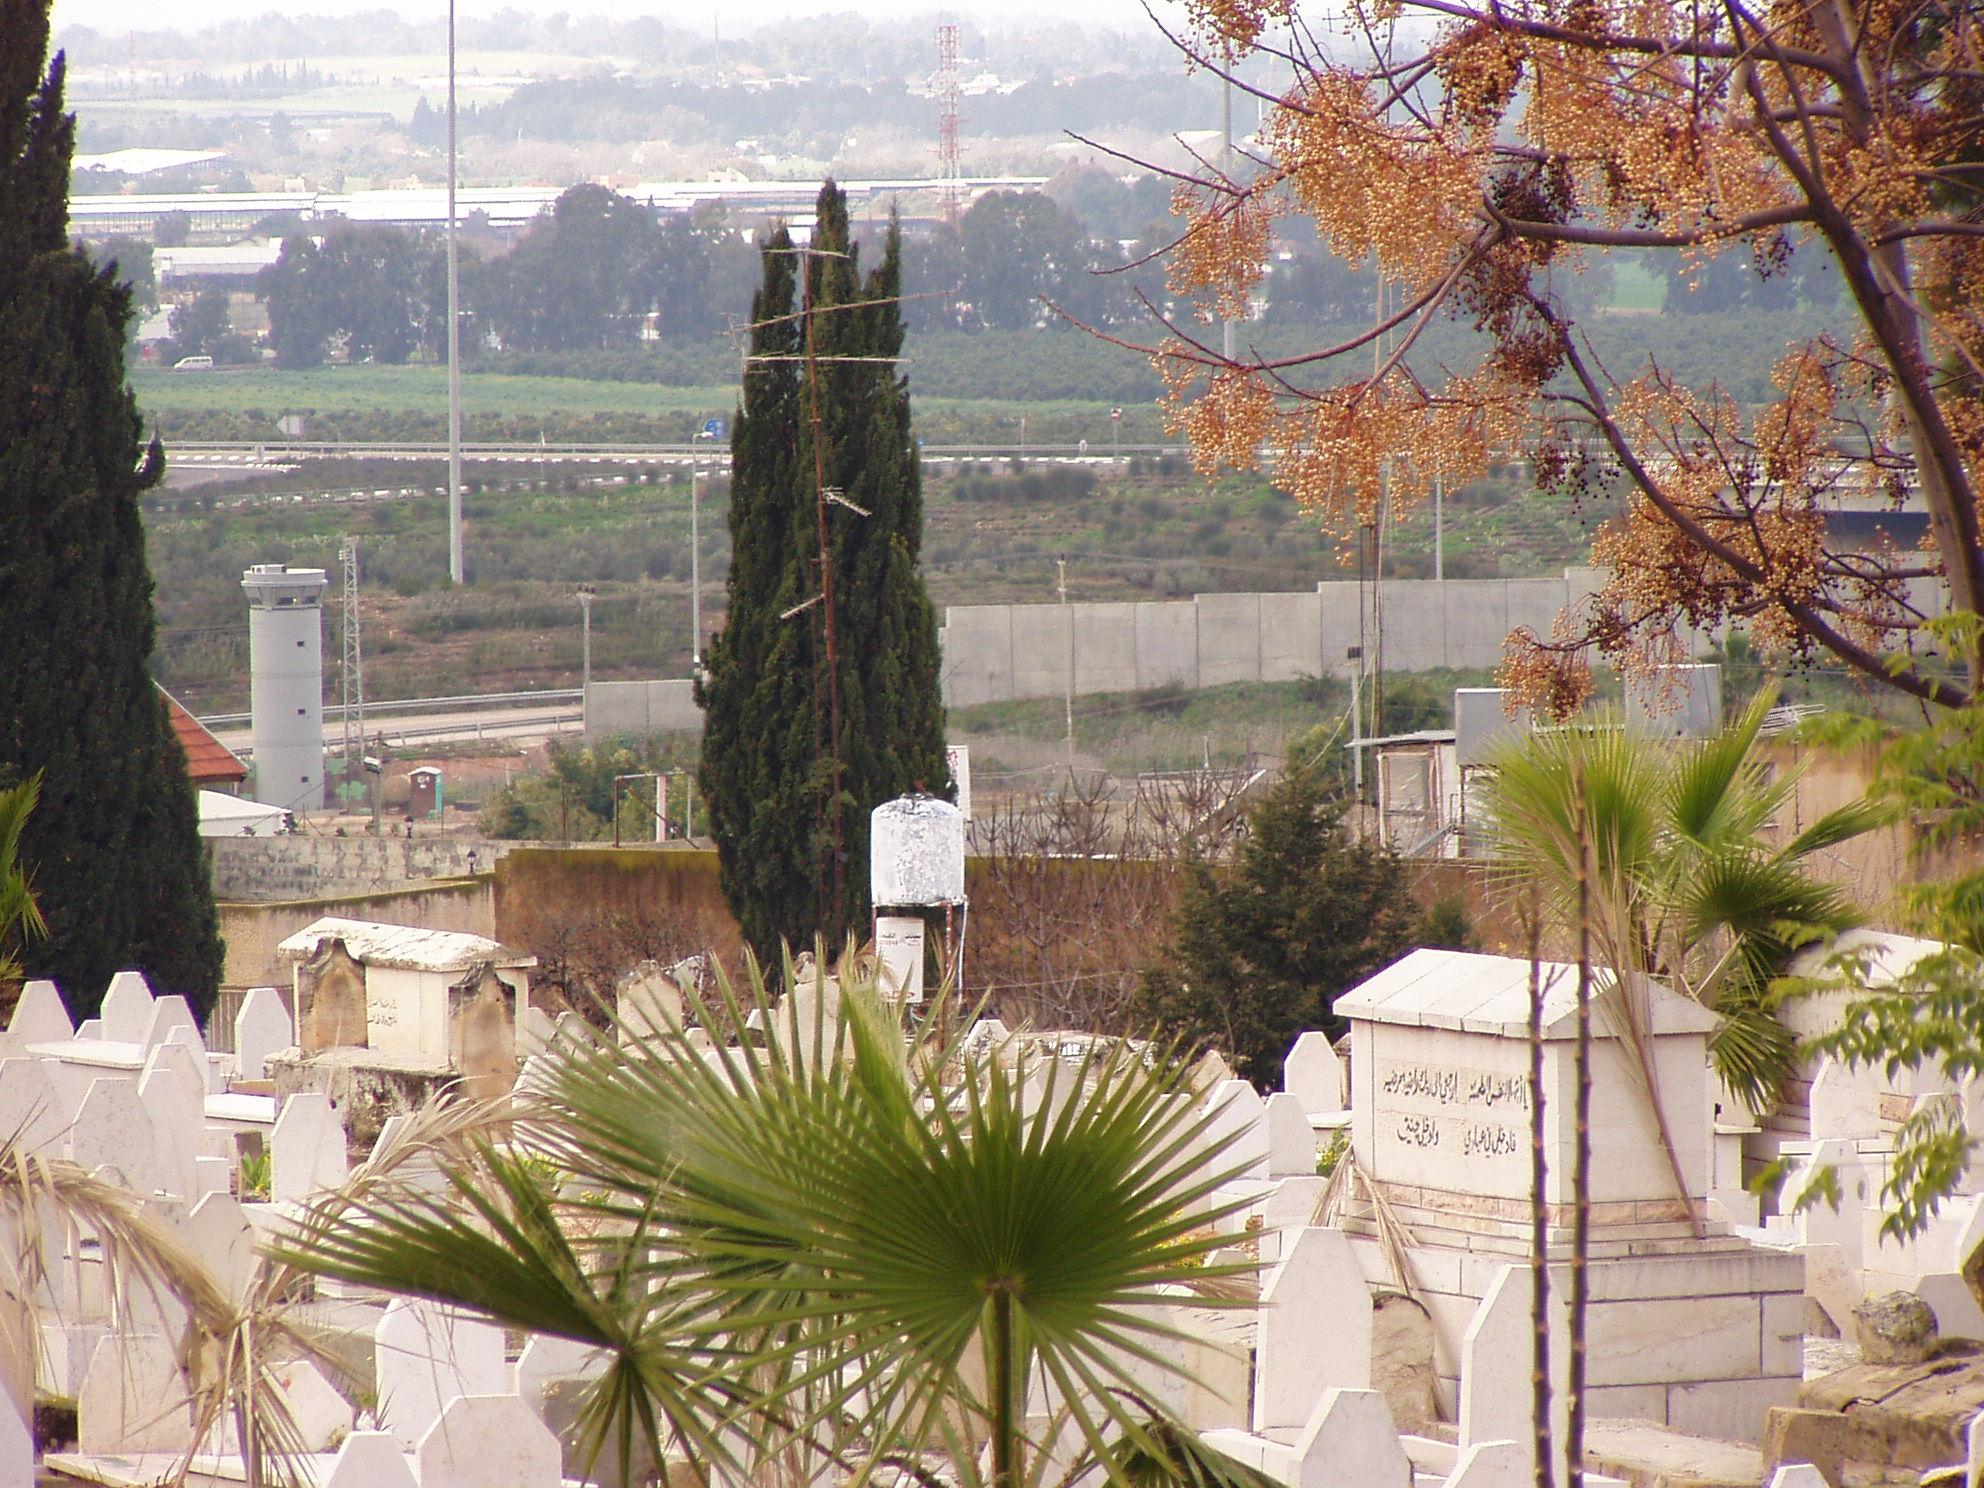 File Tulkarm Qalqilya Cemetery Jpg Wikimedia Commons